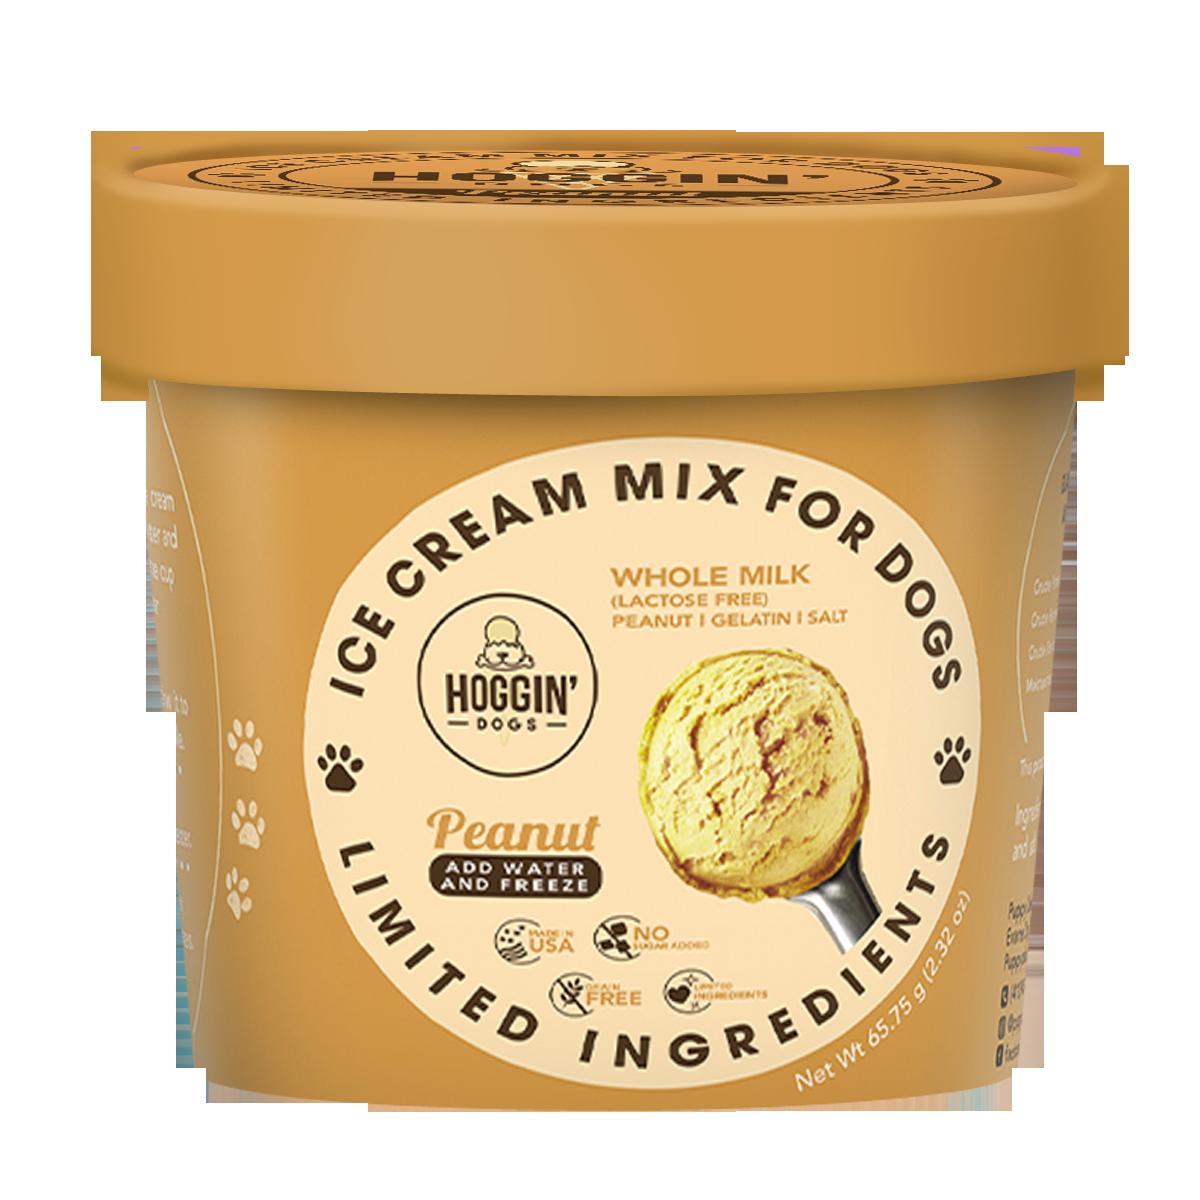 Puppy Cake Hoggin' Dogs Ice Cream Mix Peanut Butter Flavored Dog Treats, 2.32-oz